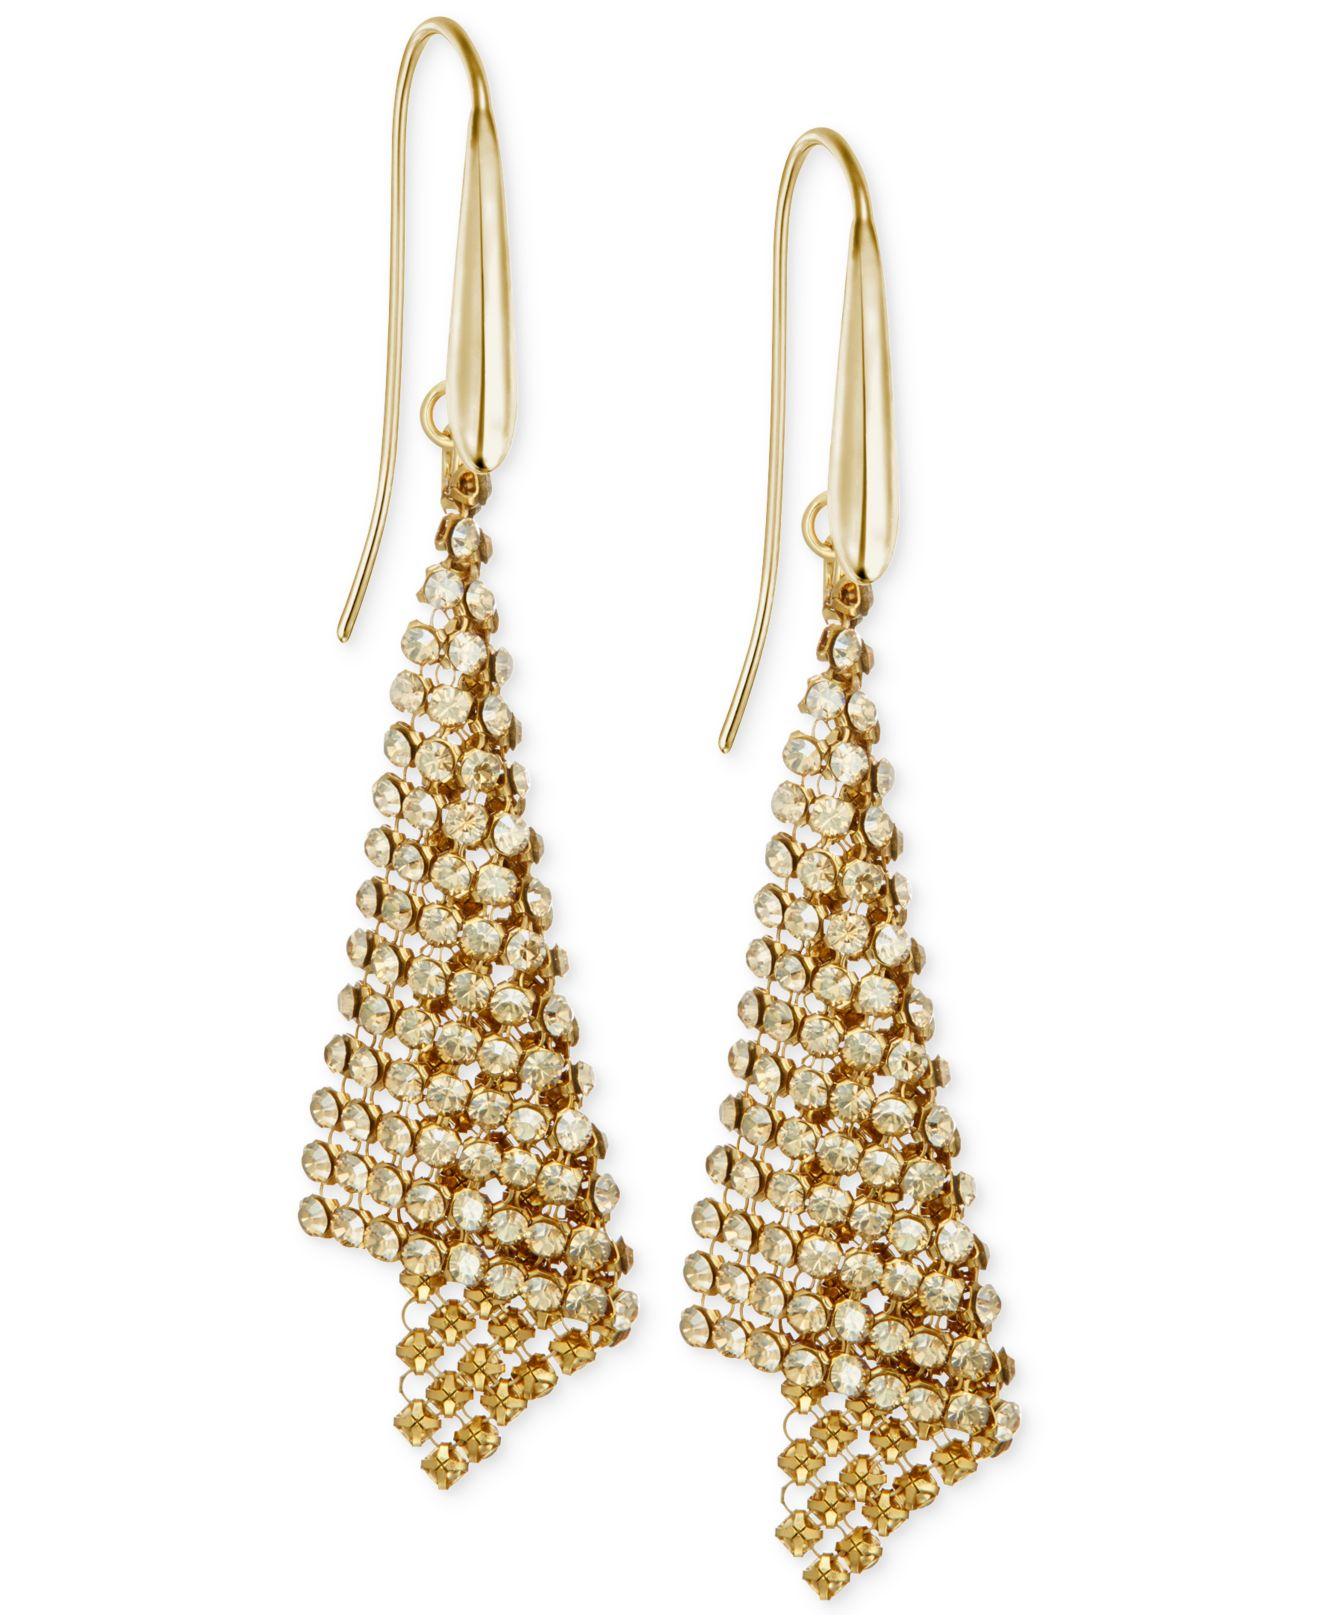 Swarovski Metallic Gold Tone Crystal Mesh Drop Earrings